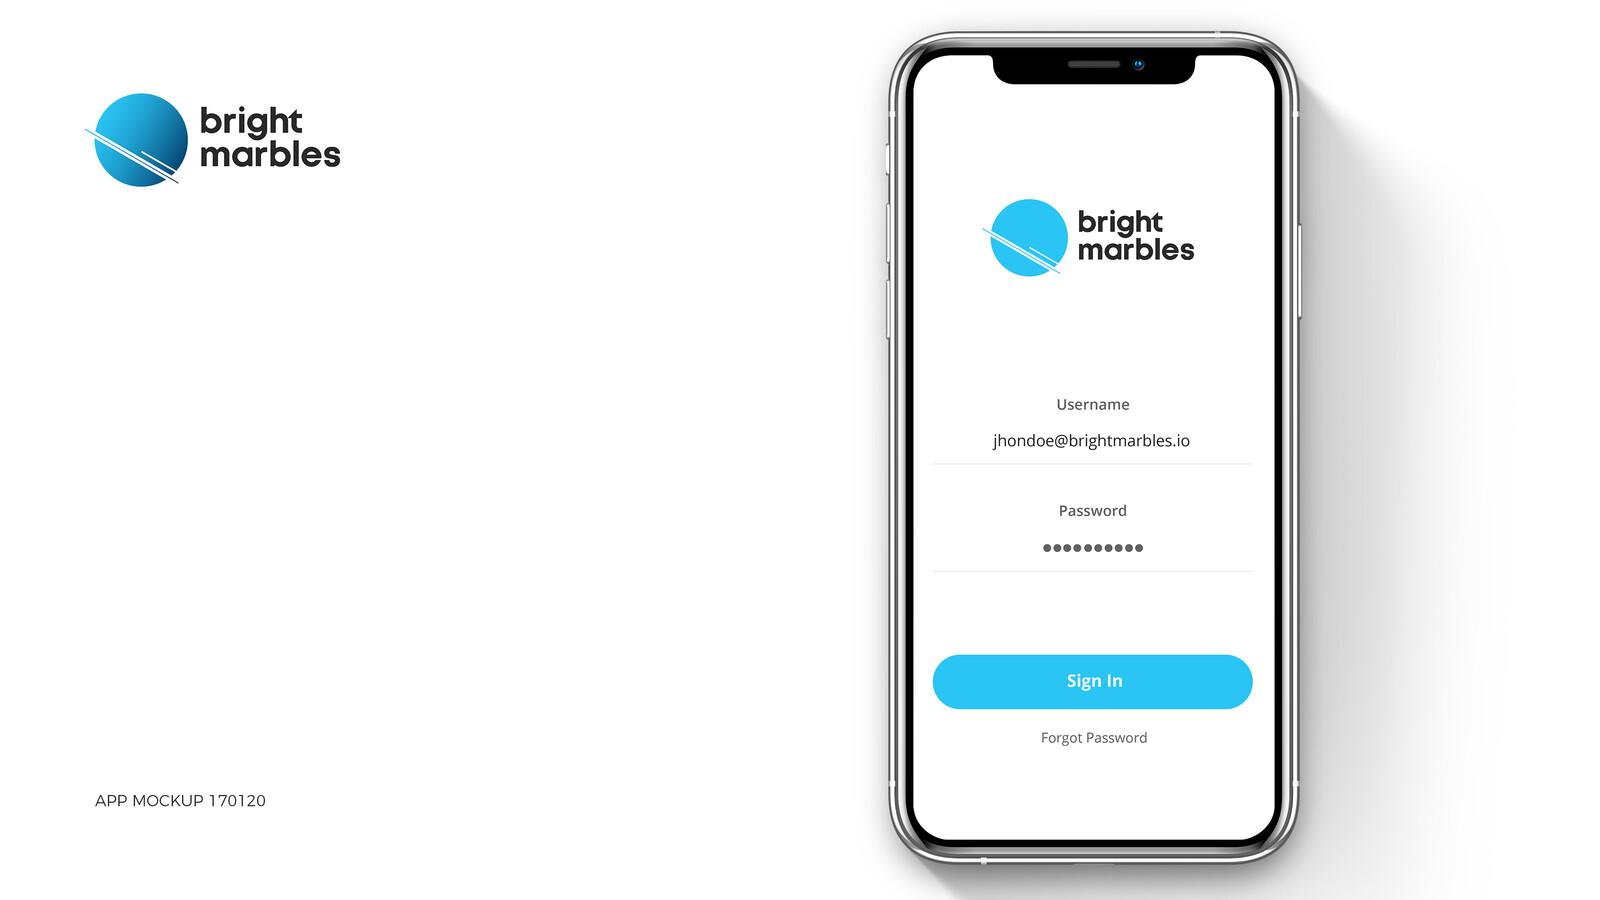 UI Vacation App - Bright Marbles